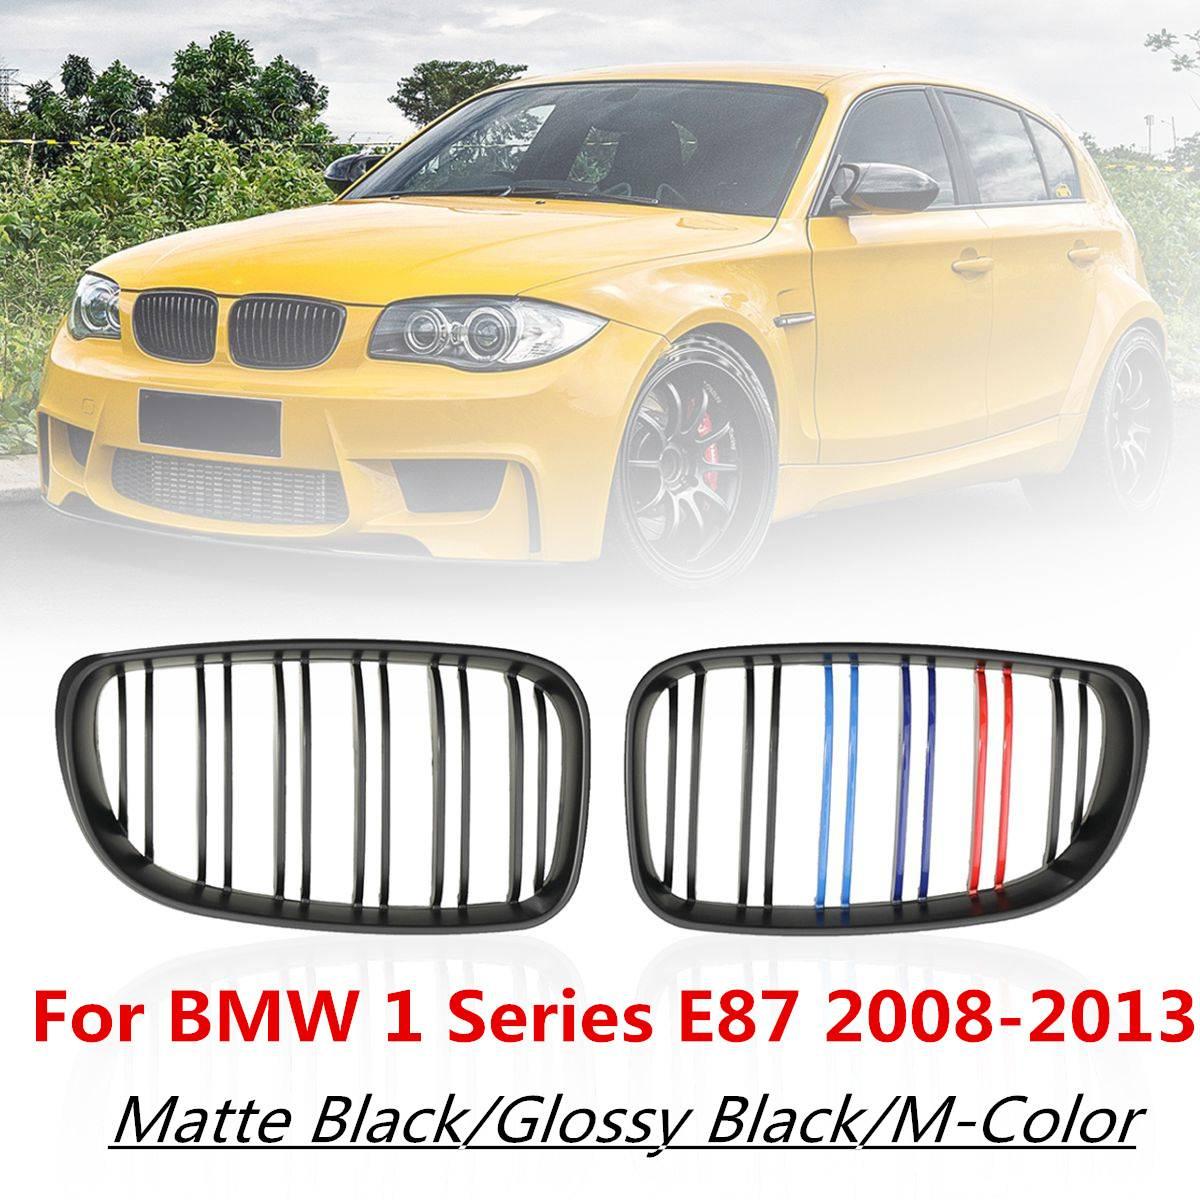 BMW NEW GENUINE E81 E82 E87 LCI E88 FRONT CENTER KIDNEY GRILLE BLACK M PAIR SET